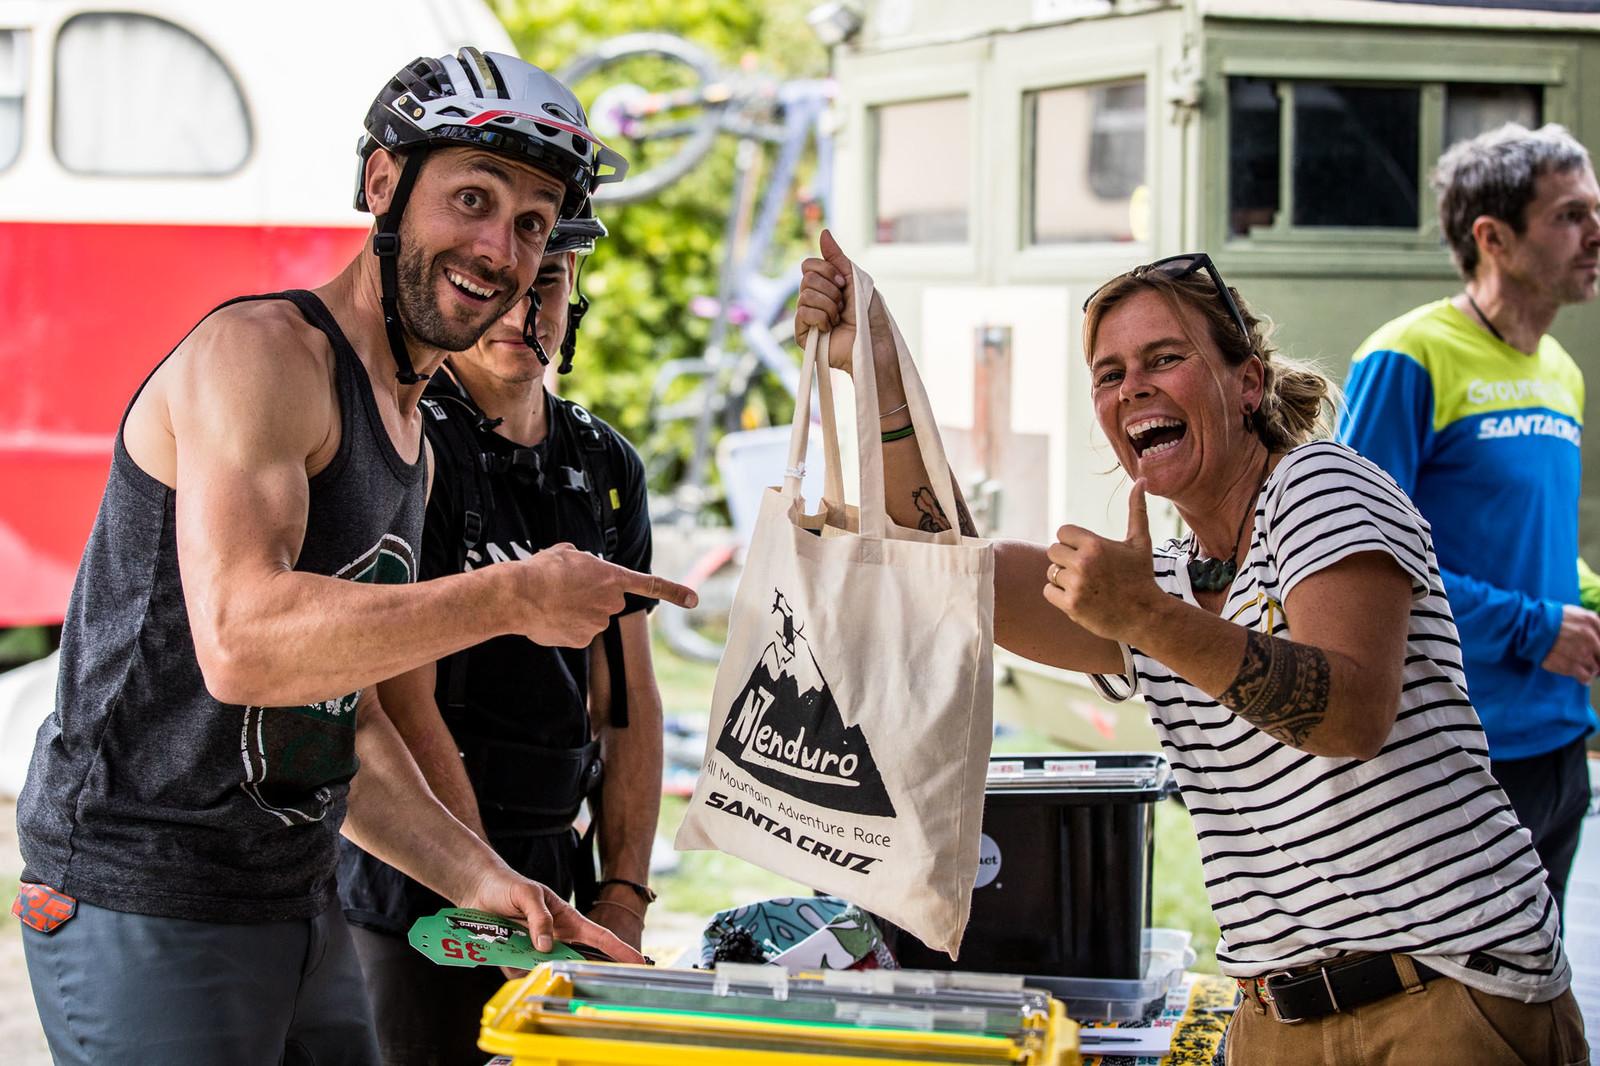 NZEnduro19 BB 898A8911 - 2019 NZ Enduro Day 1 Photo Gallery - Mountain Biking Pictures - Vital MTB